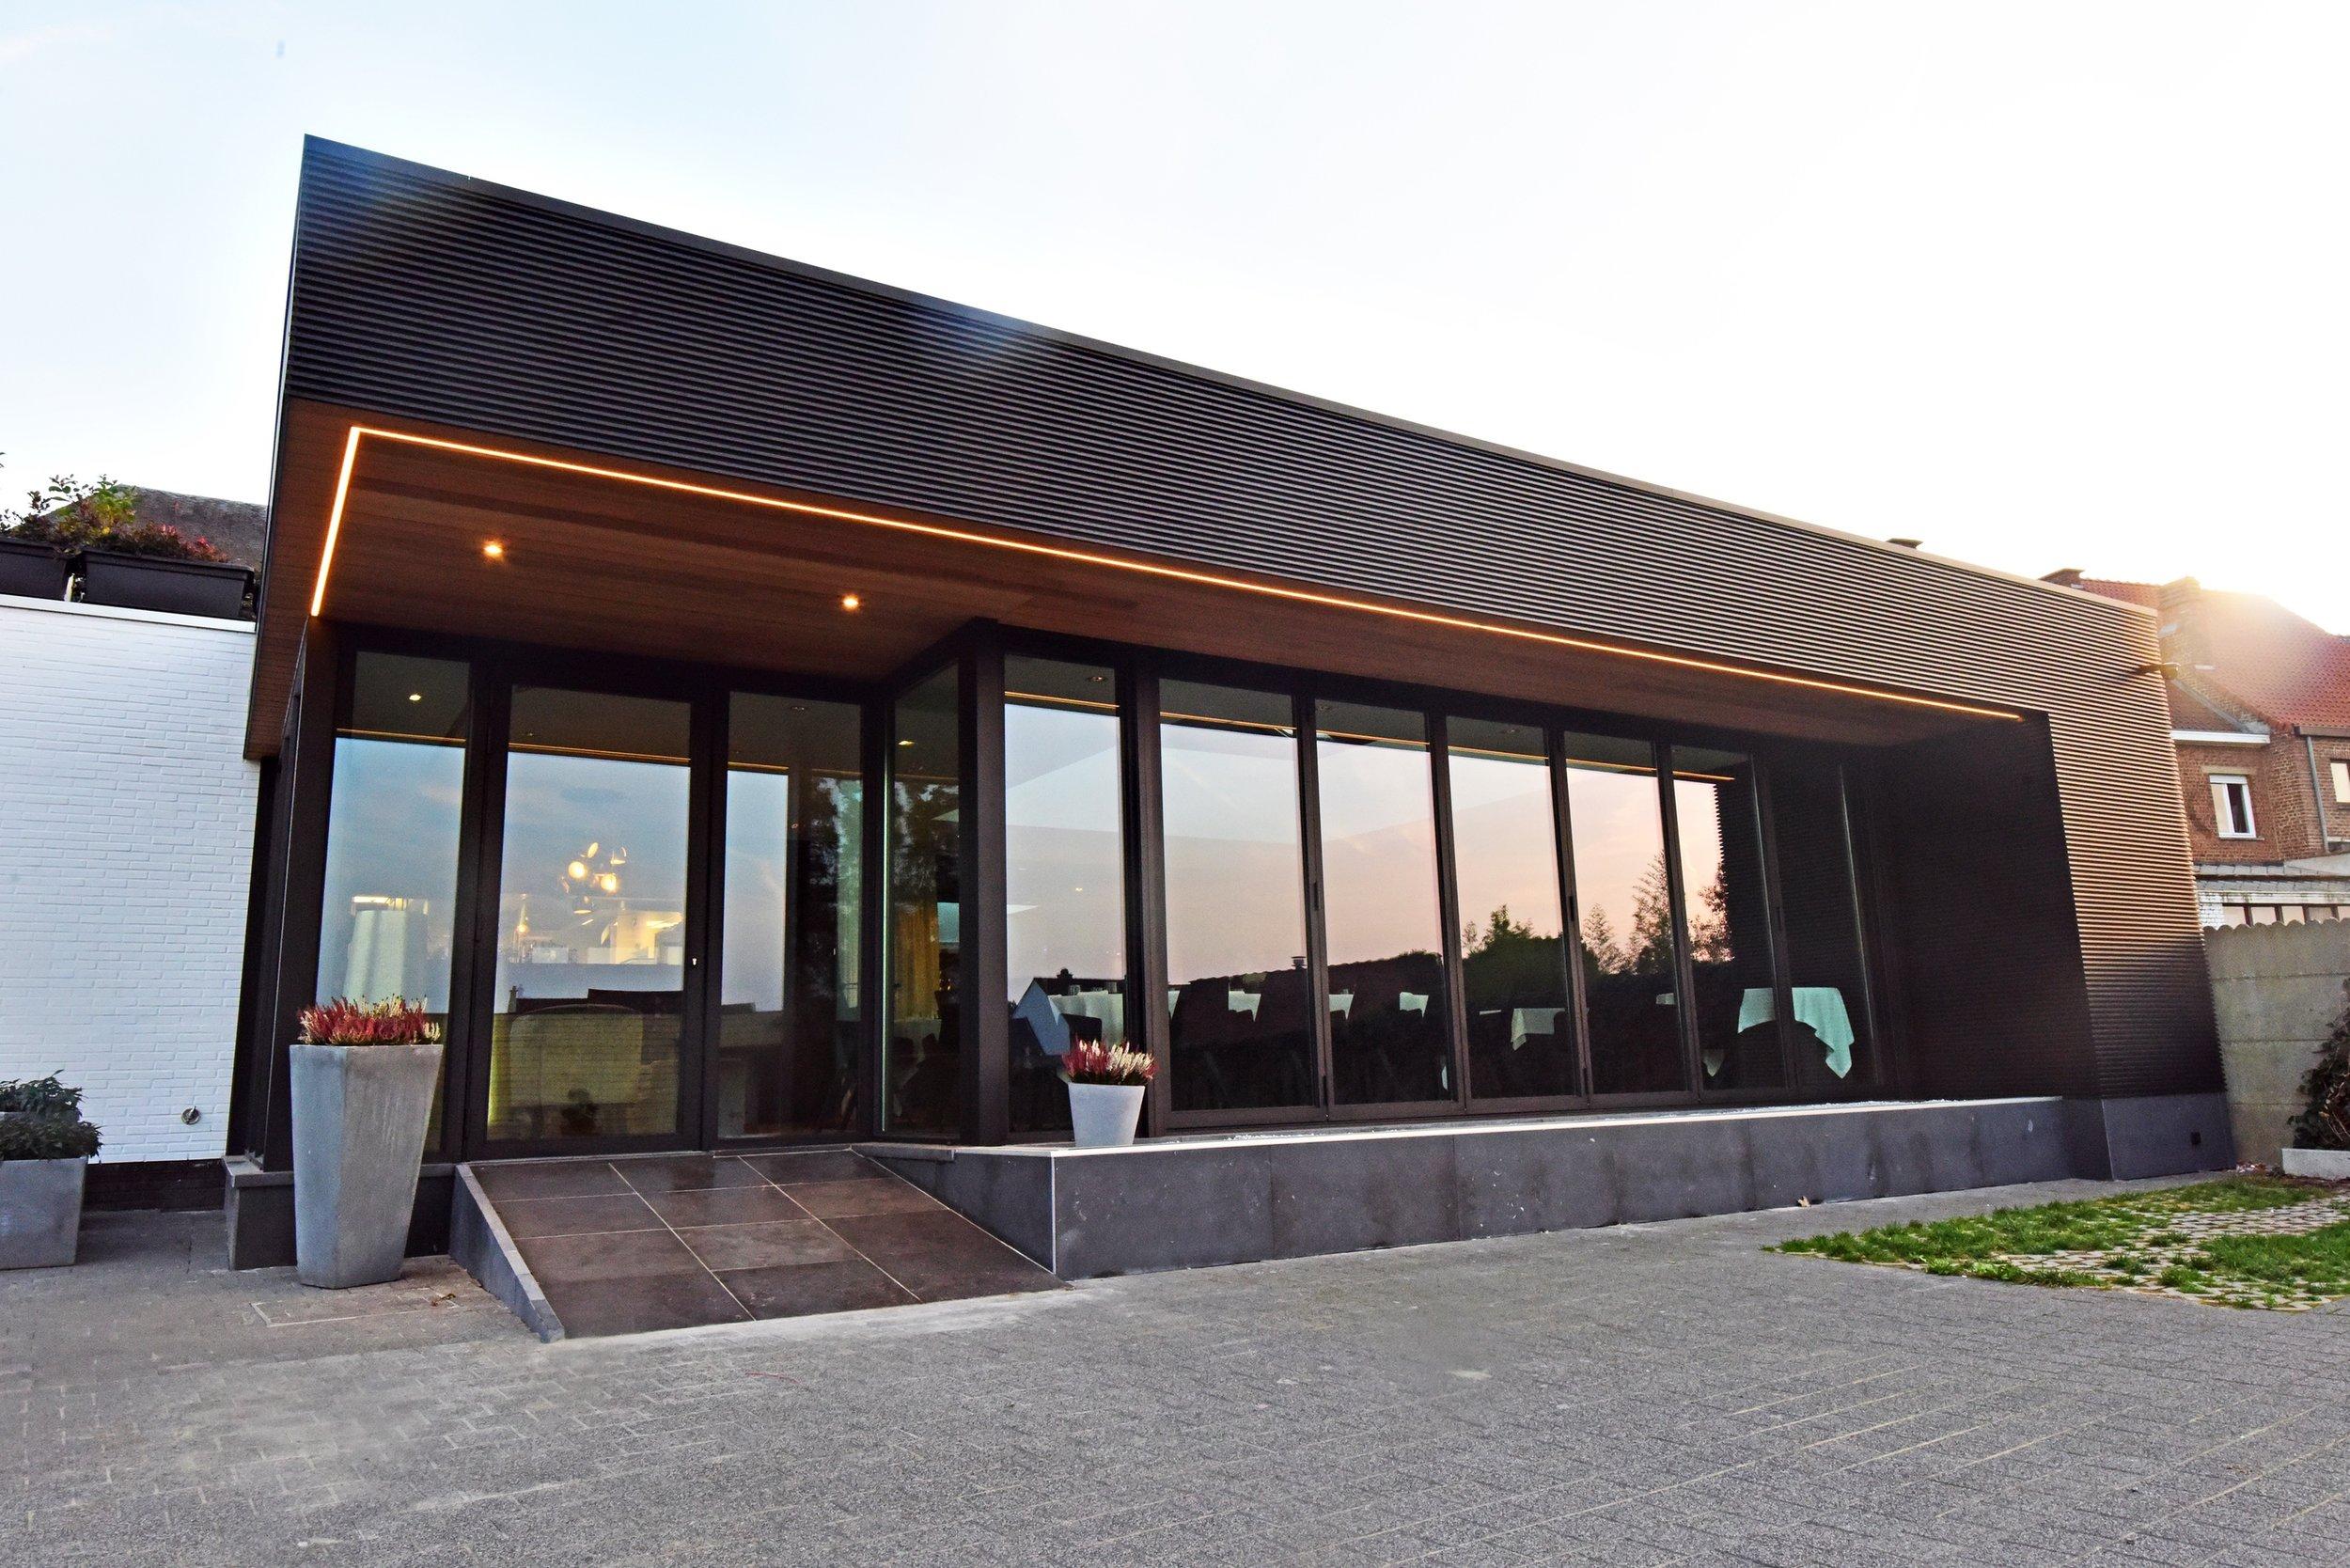 32 restaurant de bakermat ninove tablefever bart albrecht culinair fotograaf.jpg